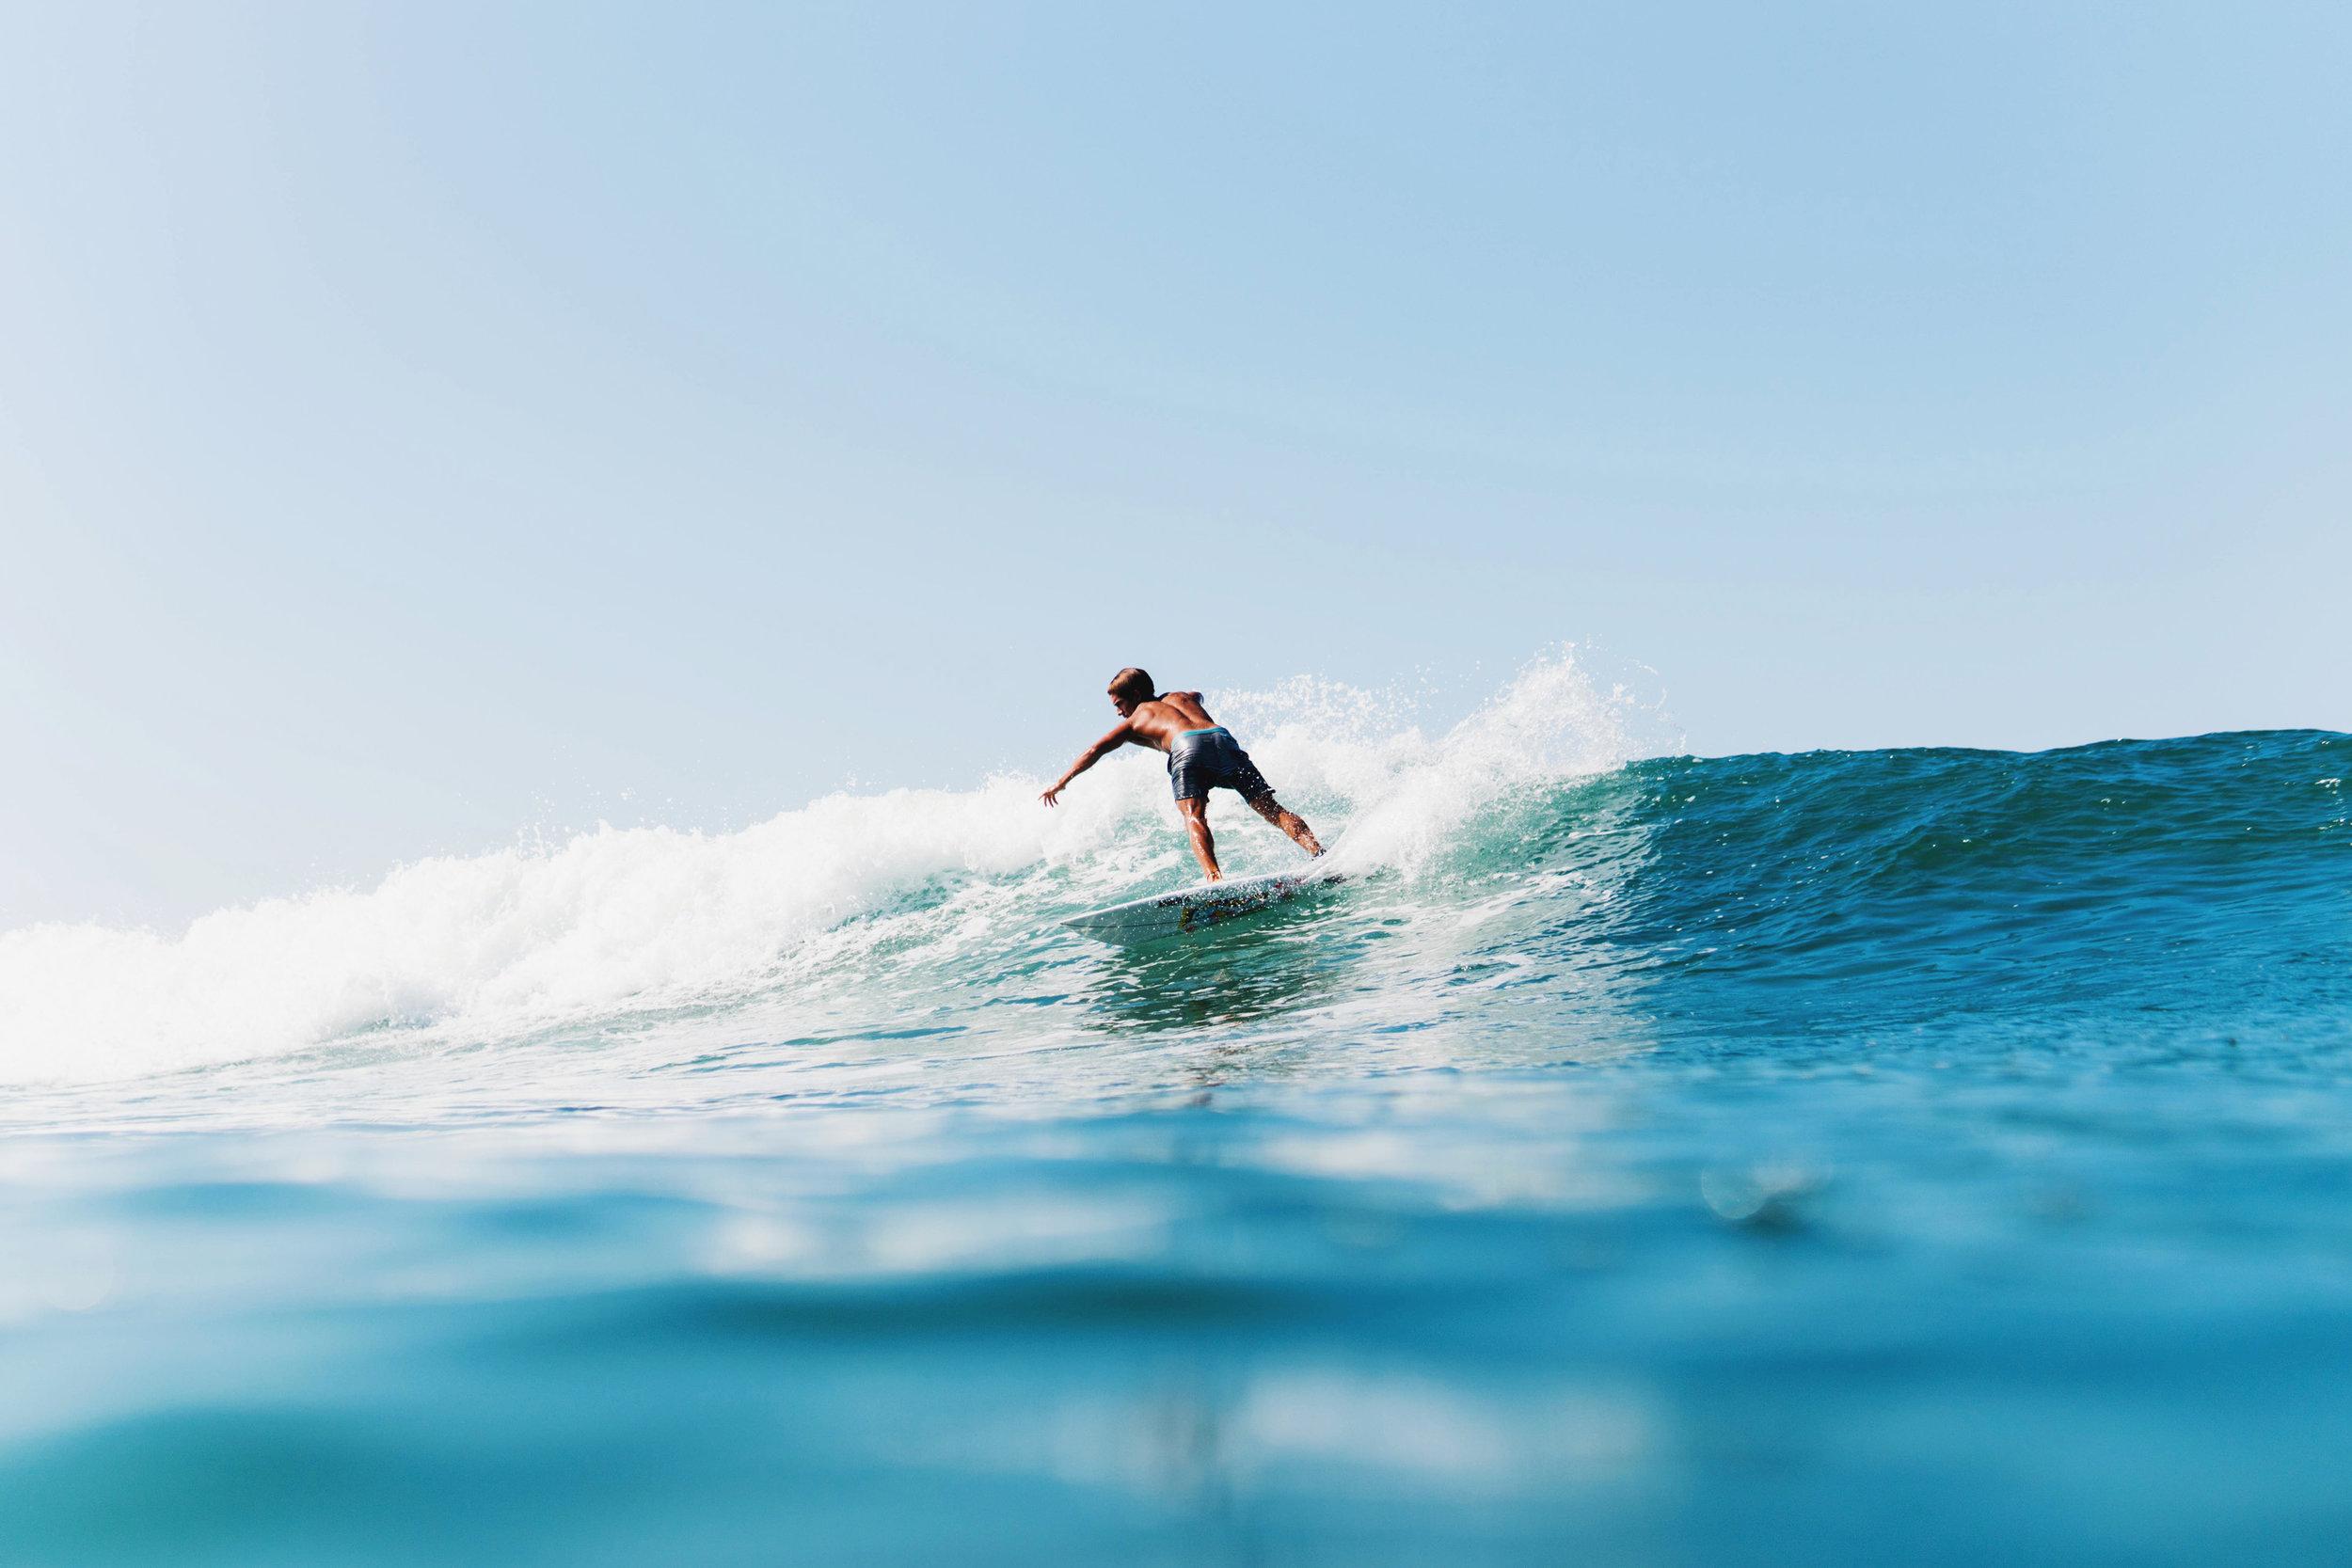 Surf-Mexico-Zihuatanejo-Sayulita-Ixtapa-Zihuatanejo-Diego-Cadena-Olas-Fotografia-Heiko-Bothe-56.jpg